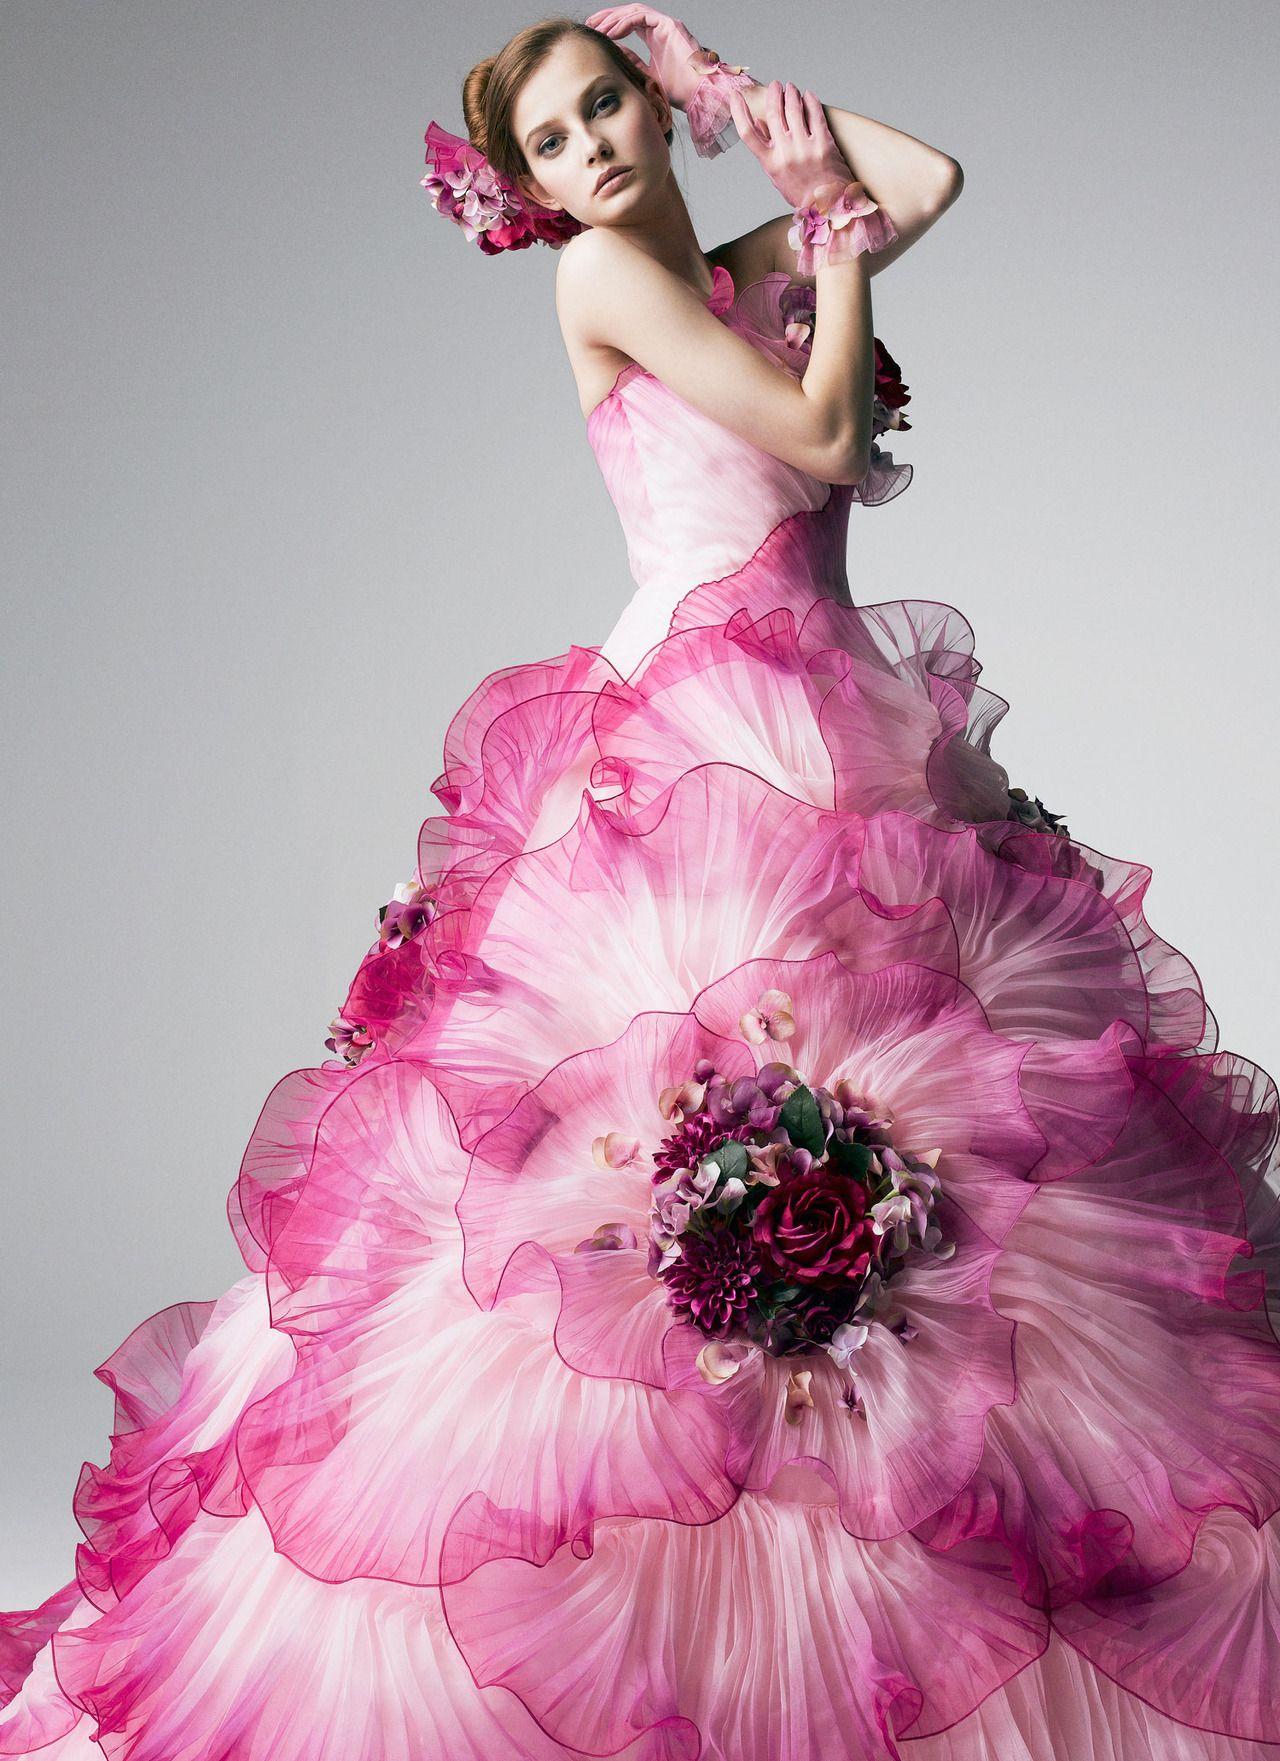 dball ~ dress ballgown | fashion | Pinterest | Vestidos boda, Quince ...